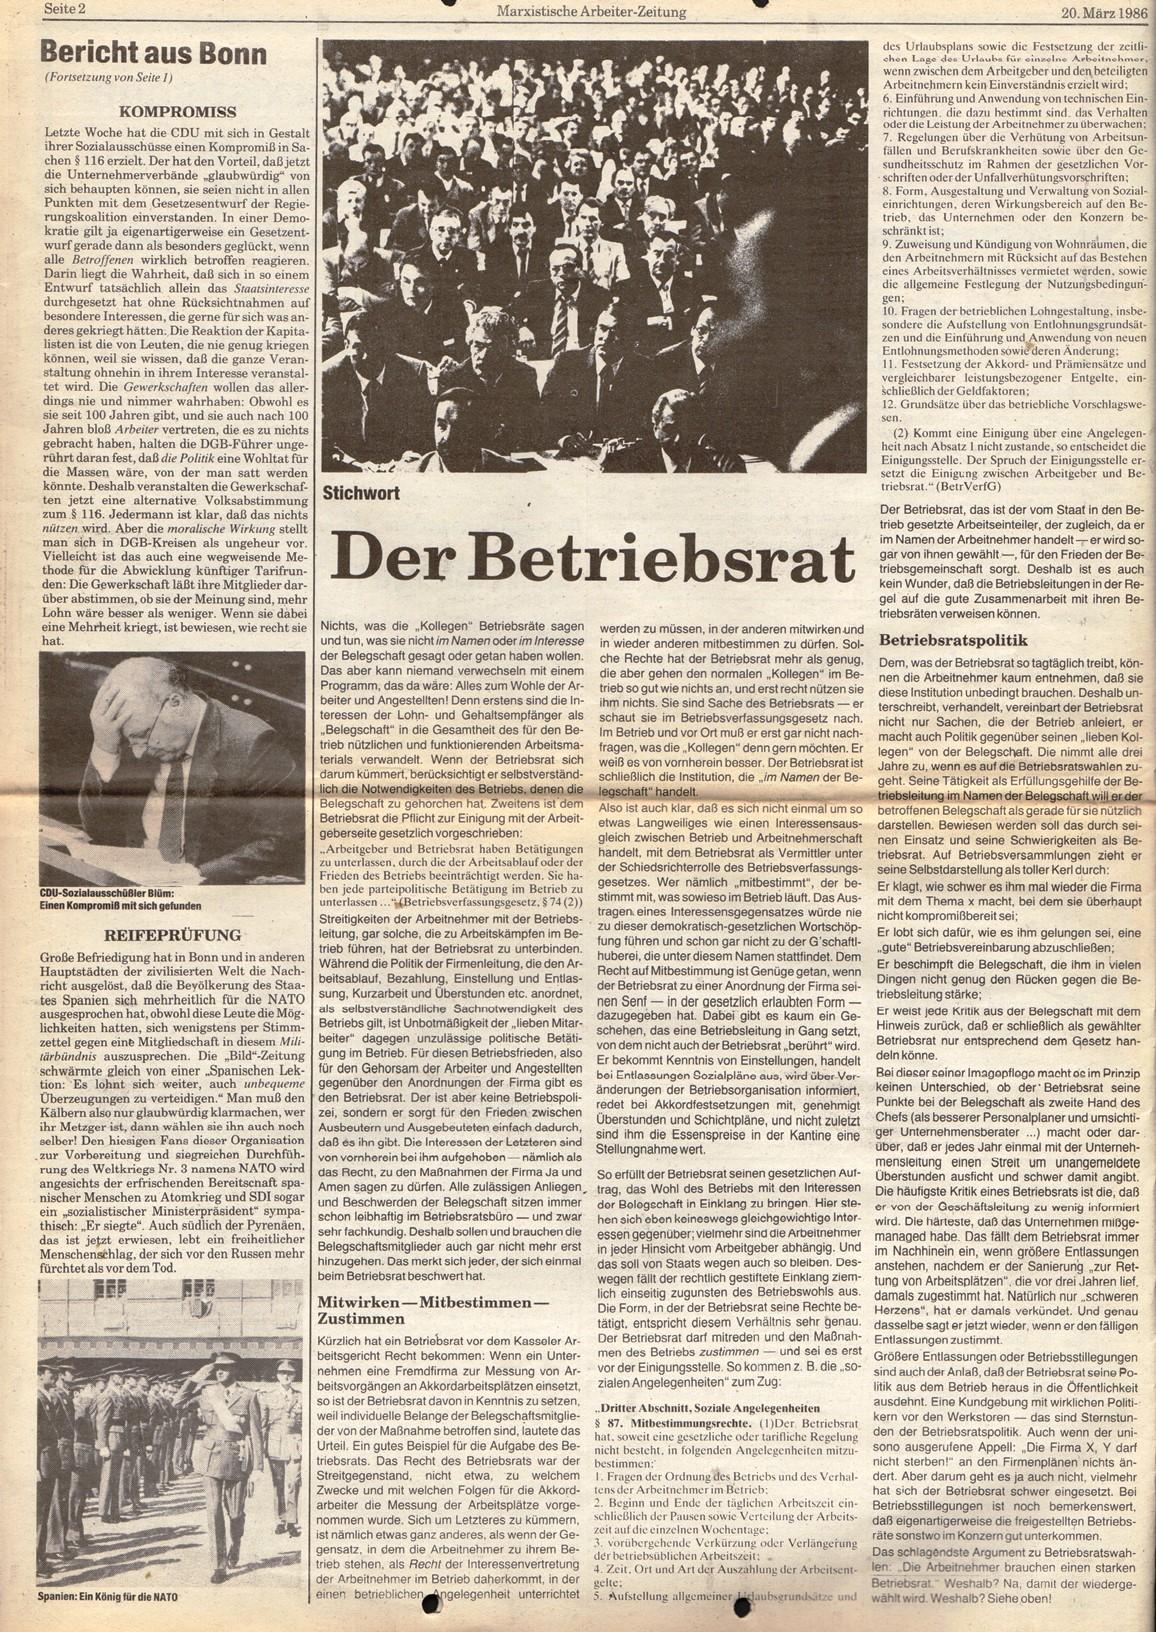 Muenchen_MG_MAZ_BMW_19860320_02